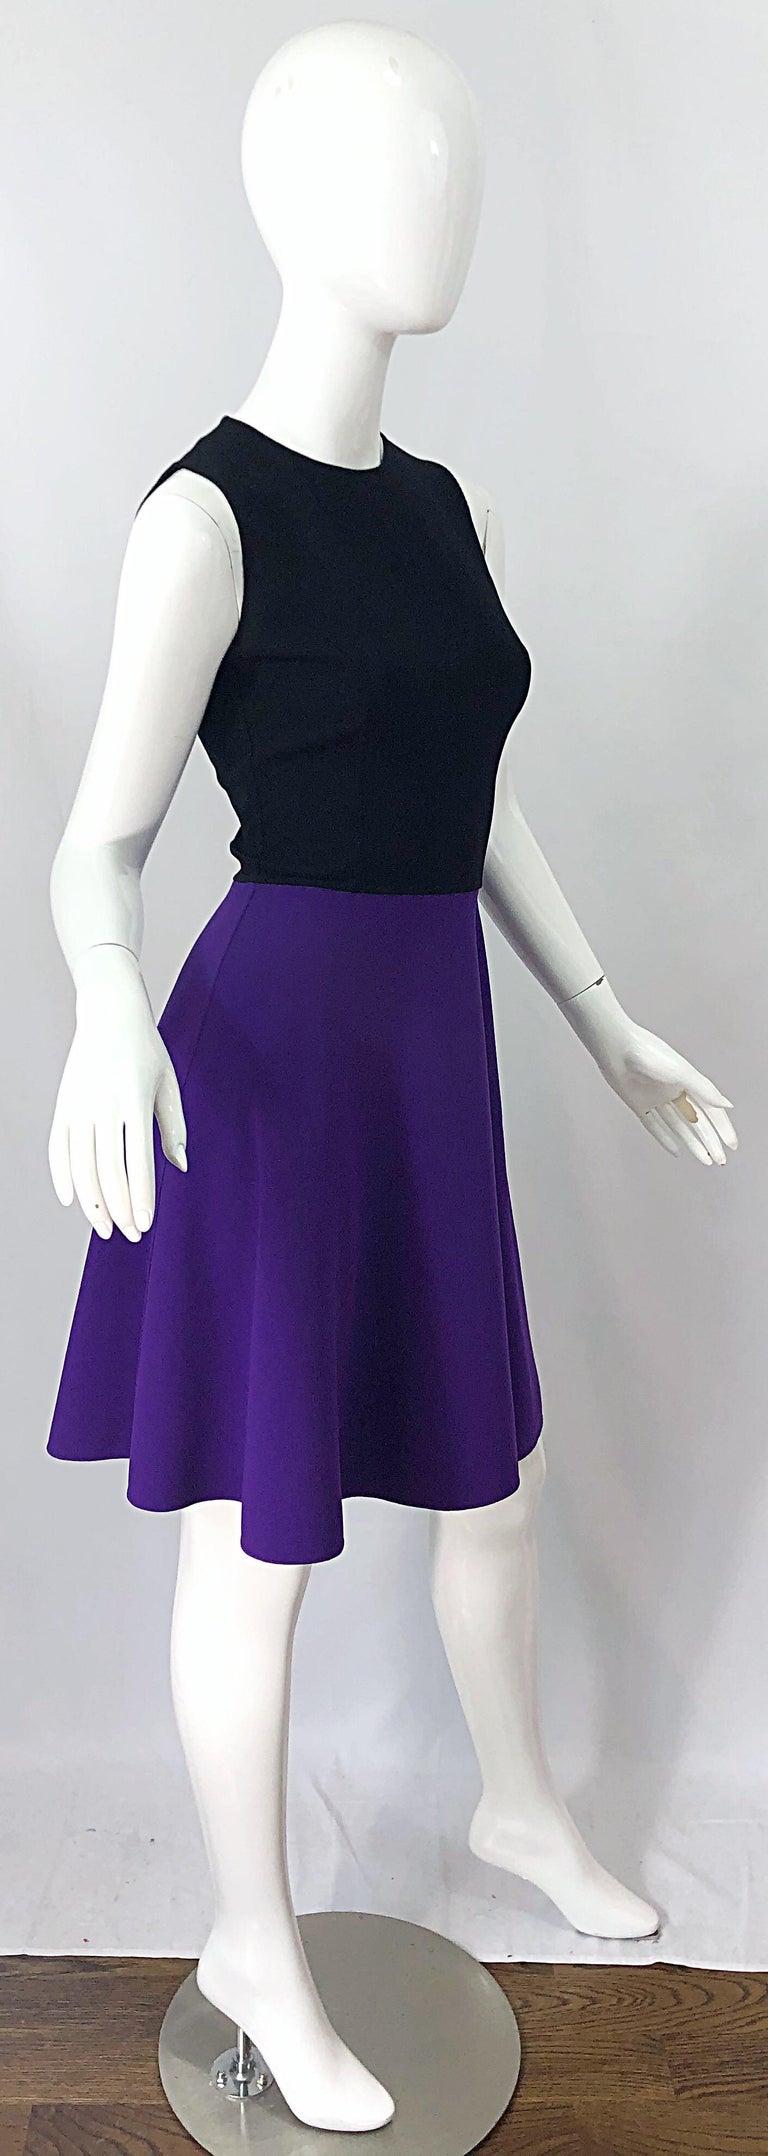 Michael Kors Collection Size 2 / 4 Purple + Black Color Block Sleeveles Dress For Sale 2